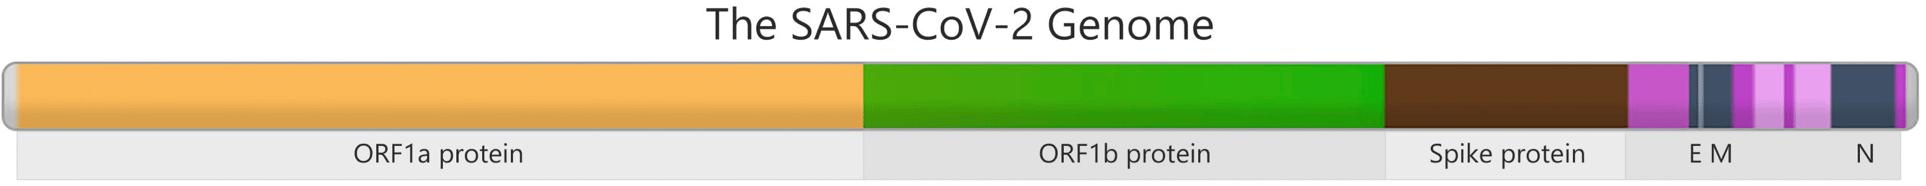 Illustration: SARS-CoV2 Genome